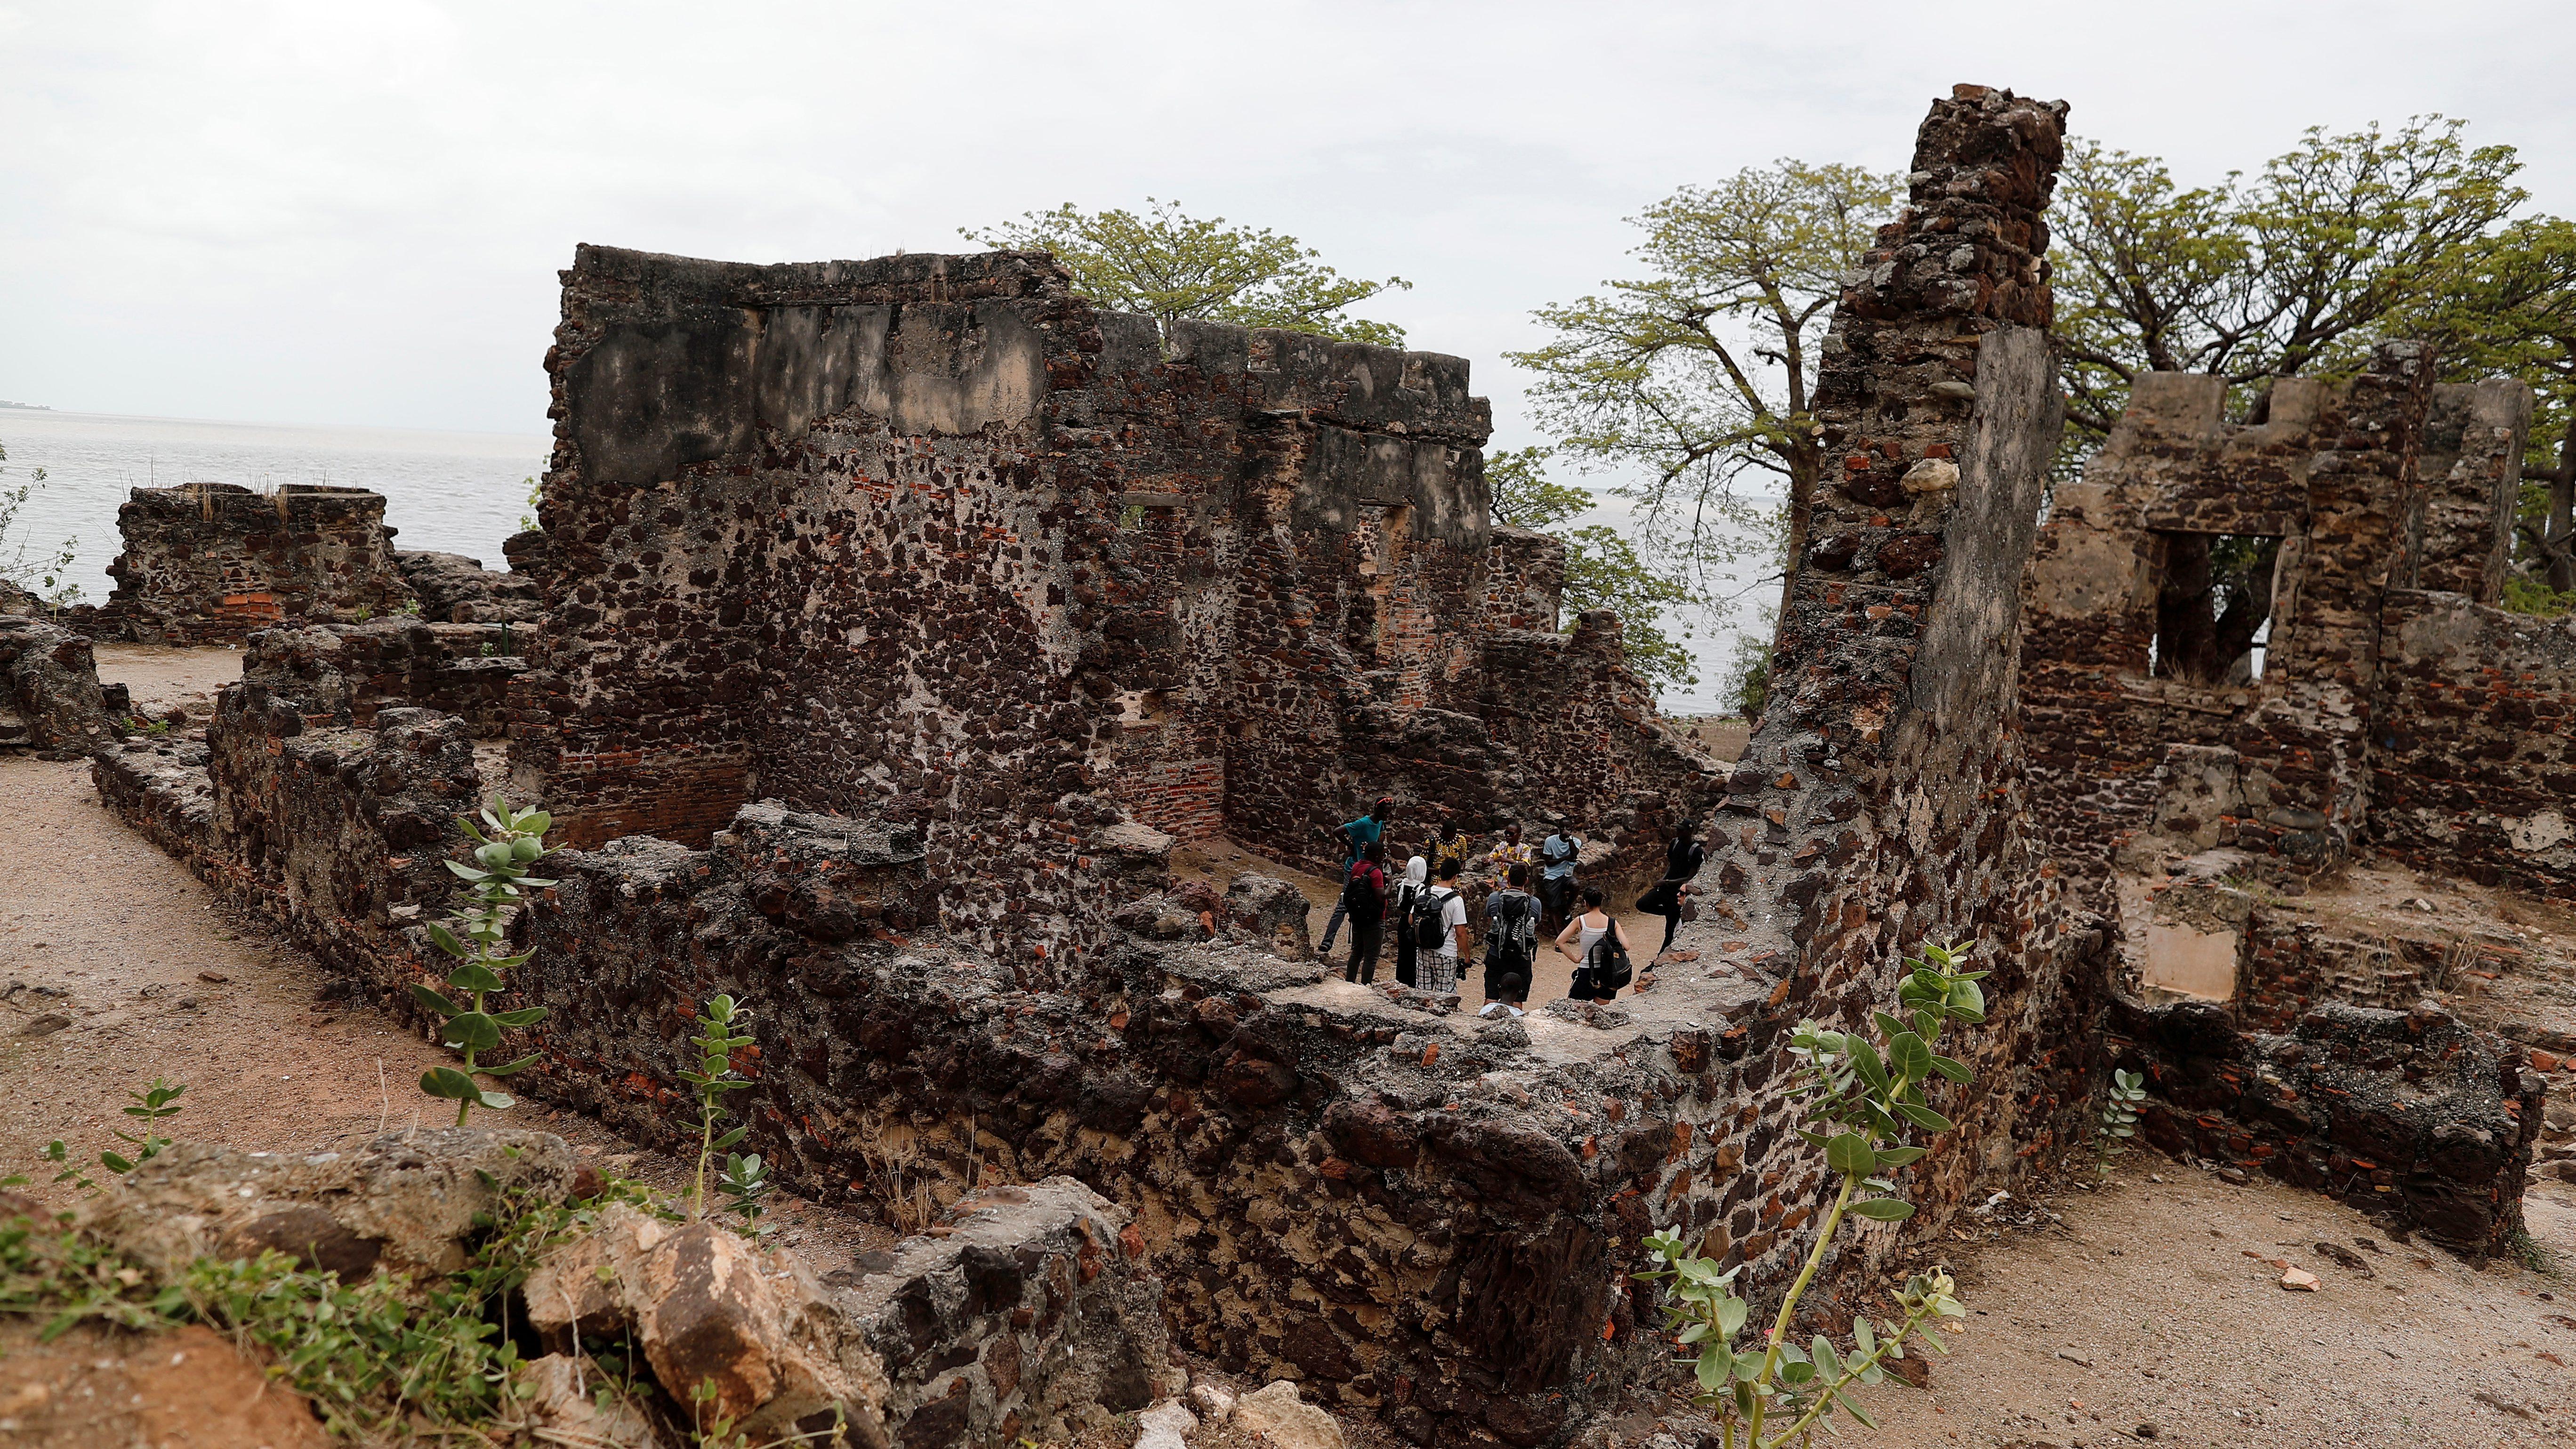 Tourists visit the ruins of Kunta Kinte island in the Gambia River, near Jufureh, Albreda